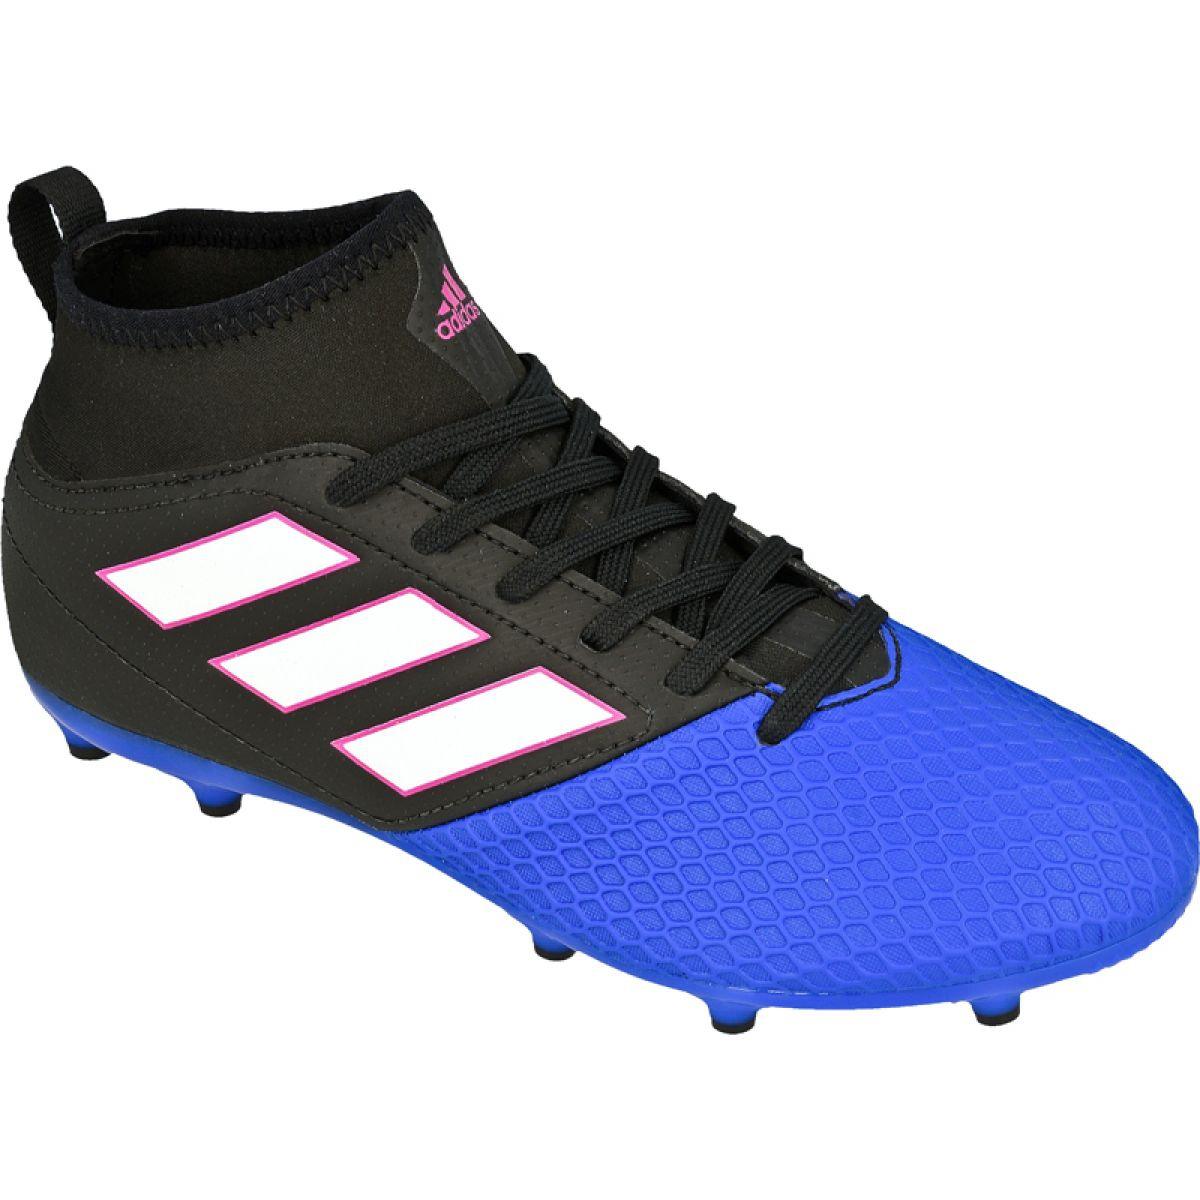 Adidas Ace 17.3 Fg Jr BA9234 football boots black multicolored